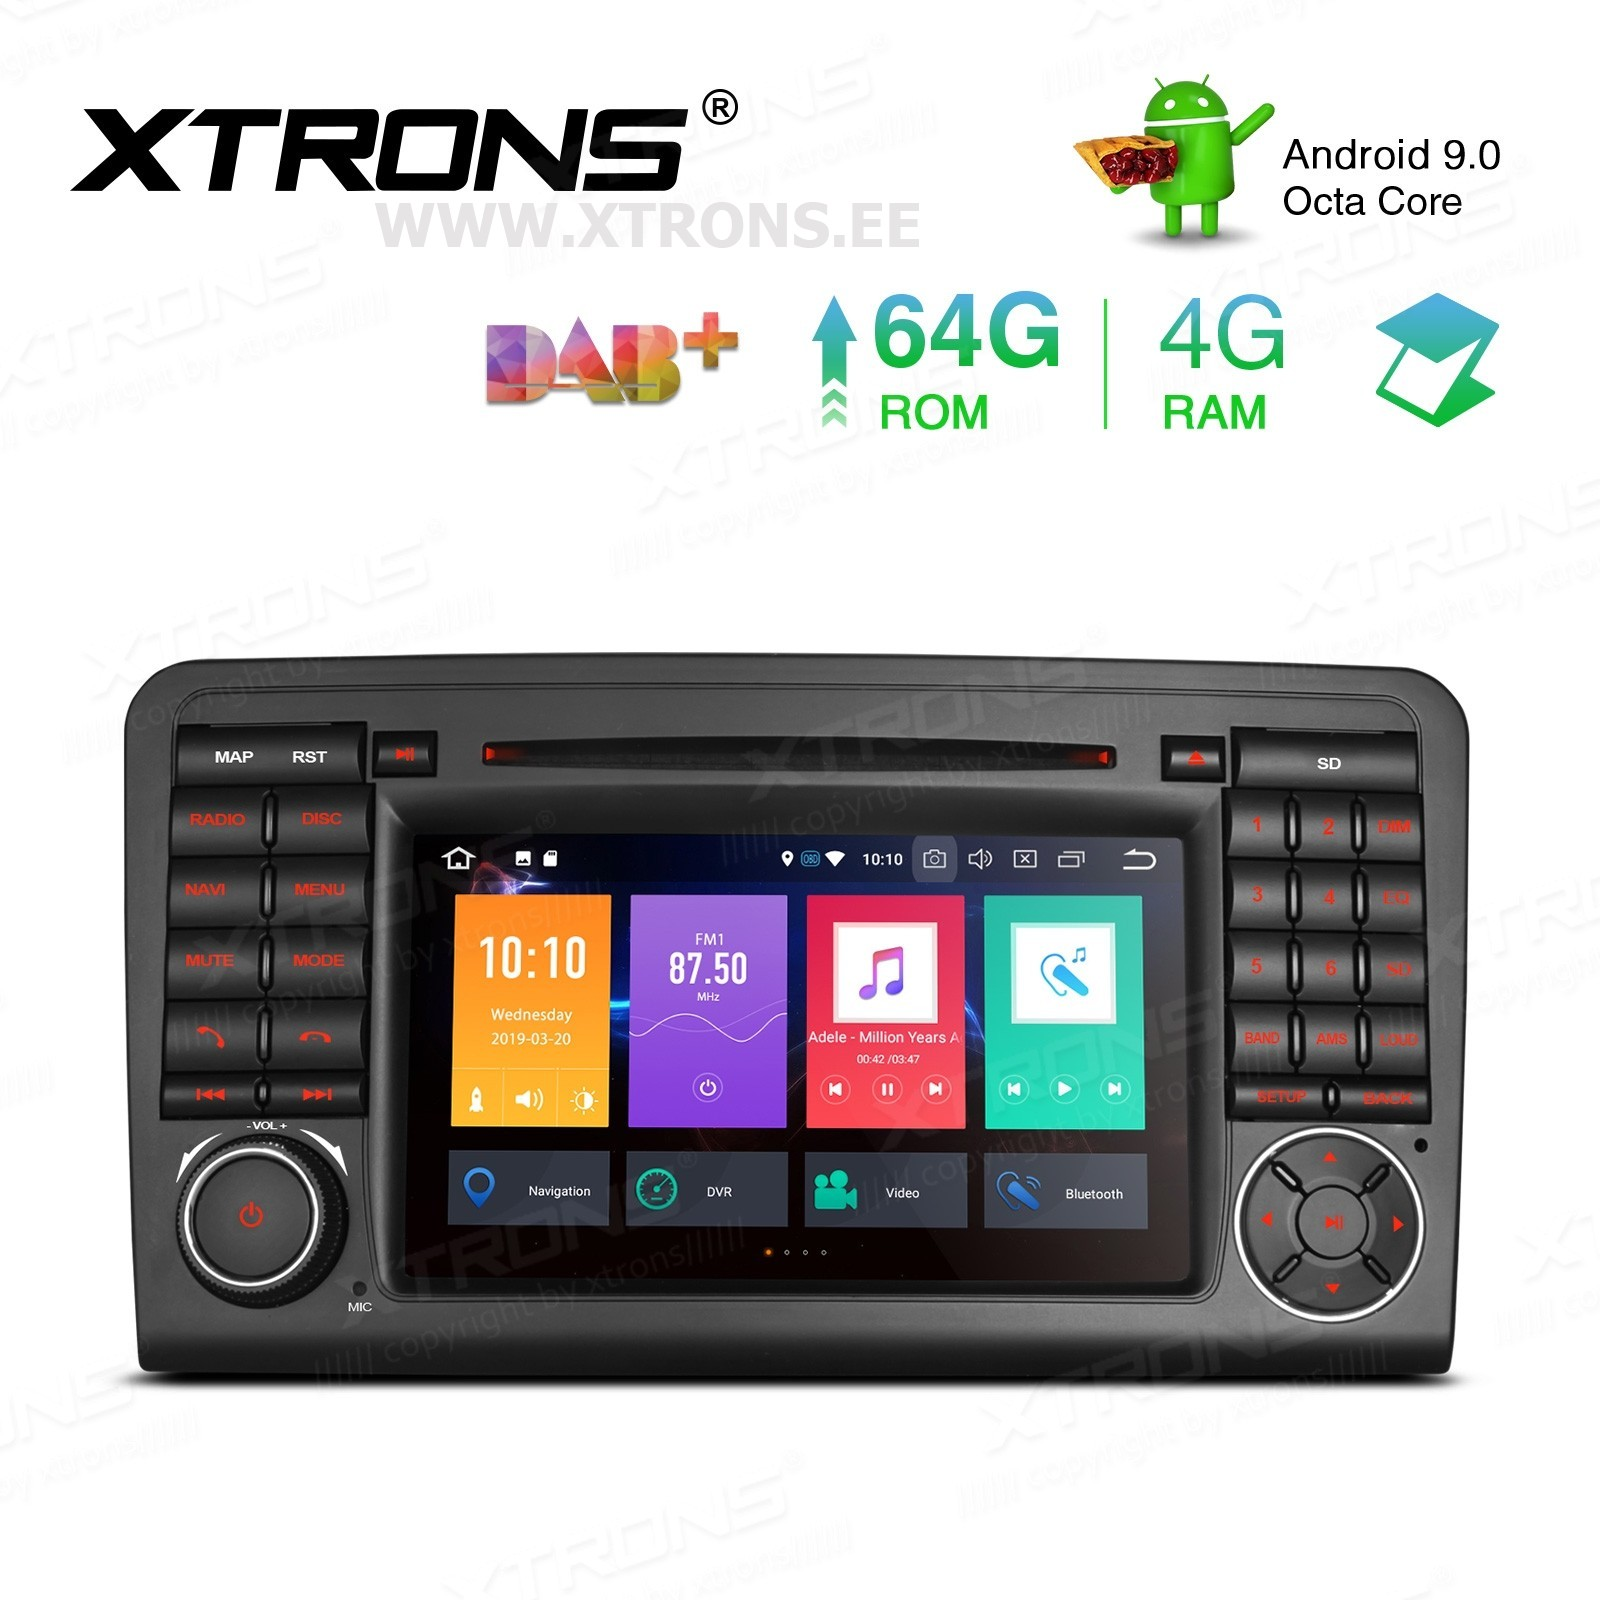 XTRONS PBX79M164